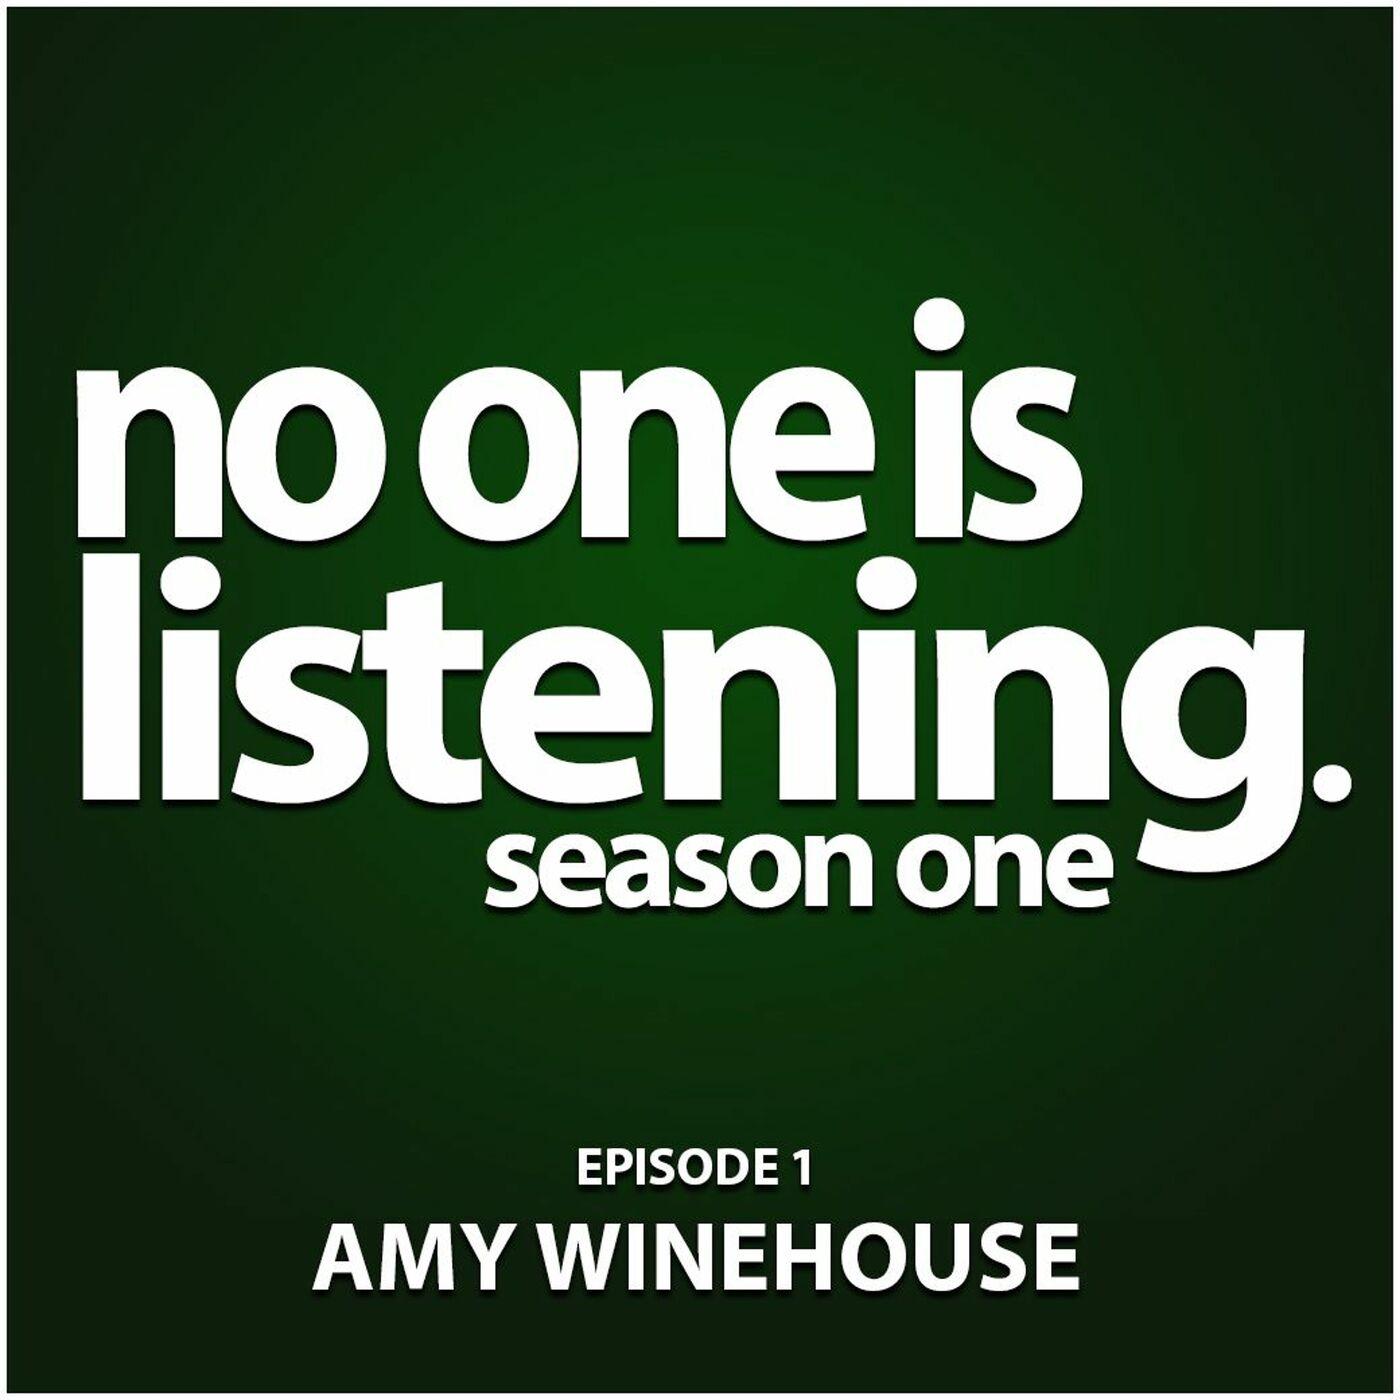 S1E1 Amy Winehouse (Pilot Episode)